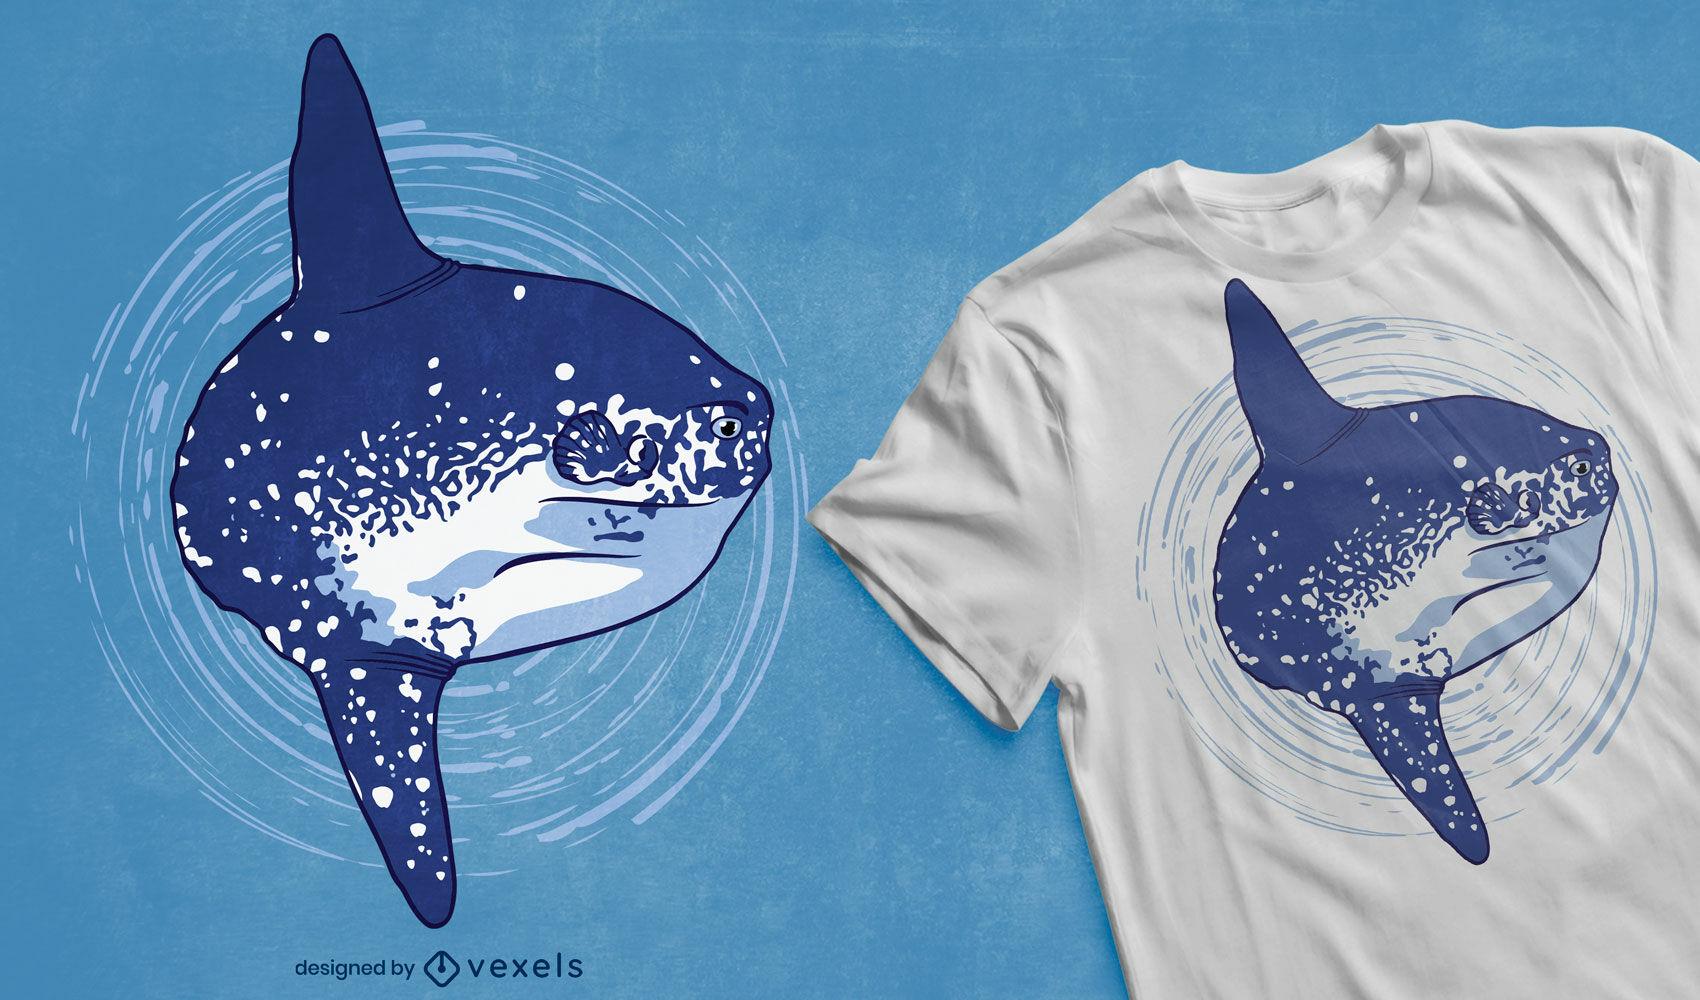 Diseño de camiseta de pez luna animal marino océano